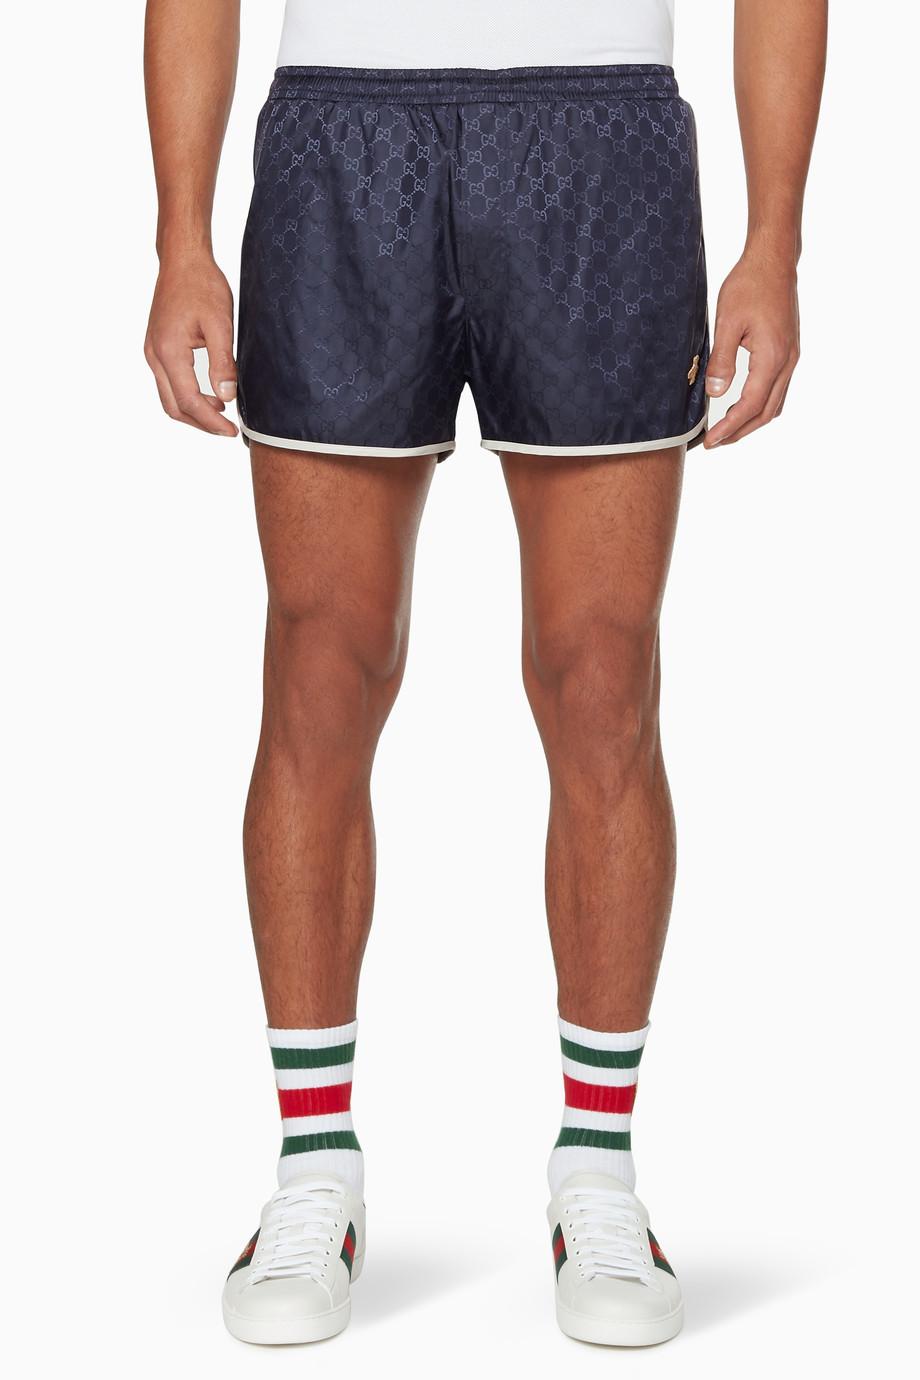 be67c945cf Shop Gucci Neutral Ink-Blue GG Swim Shorts for Men | Ounass